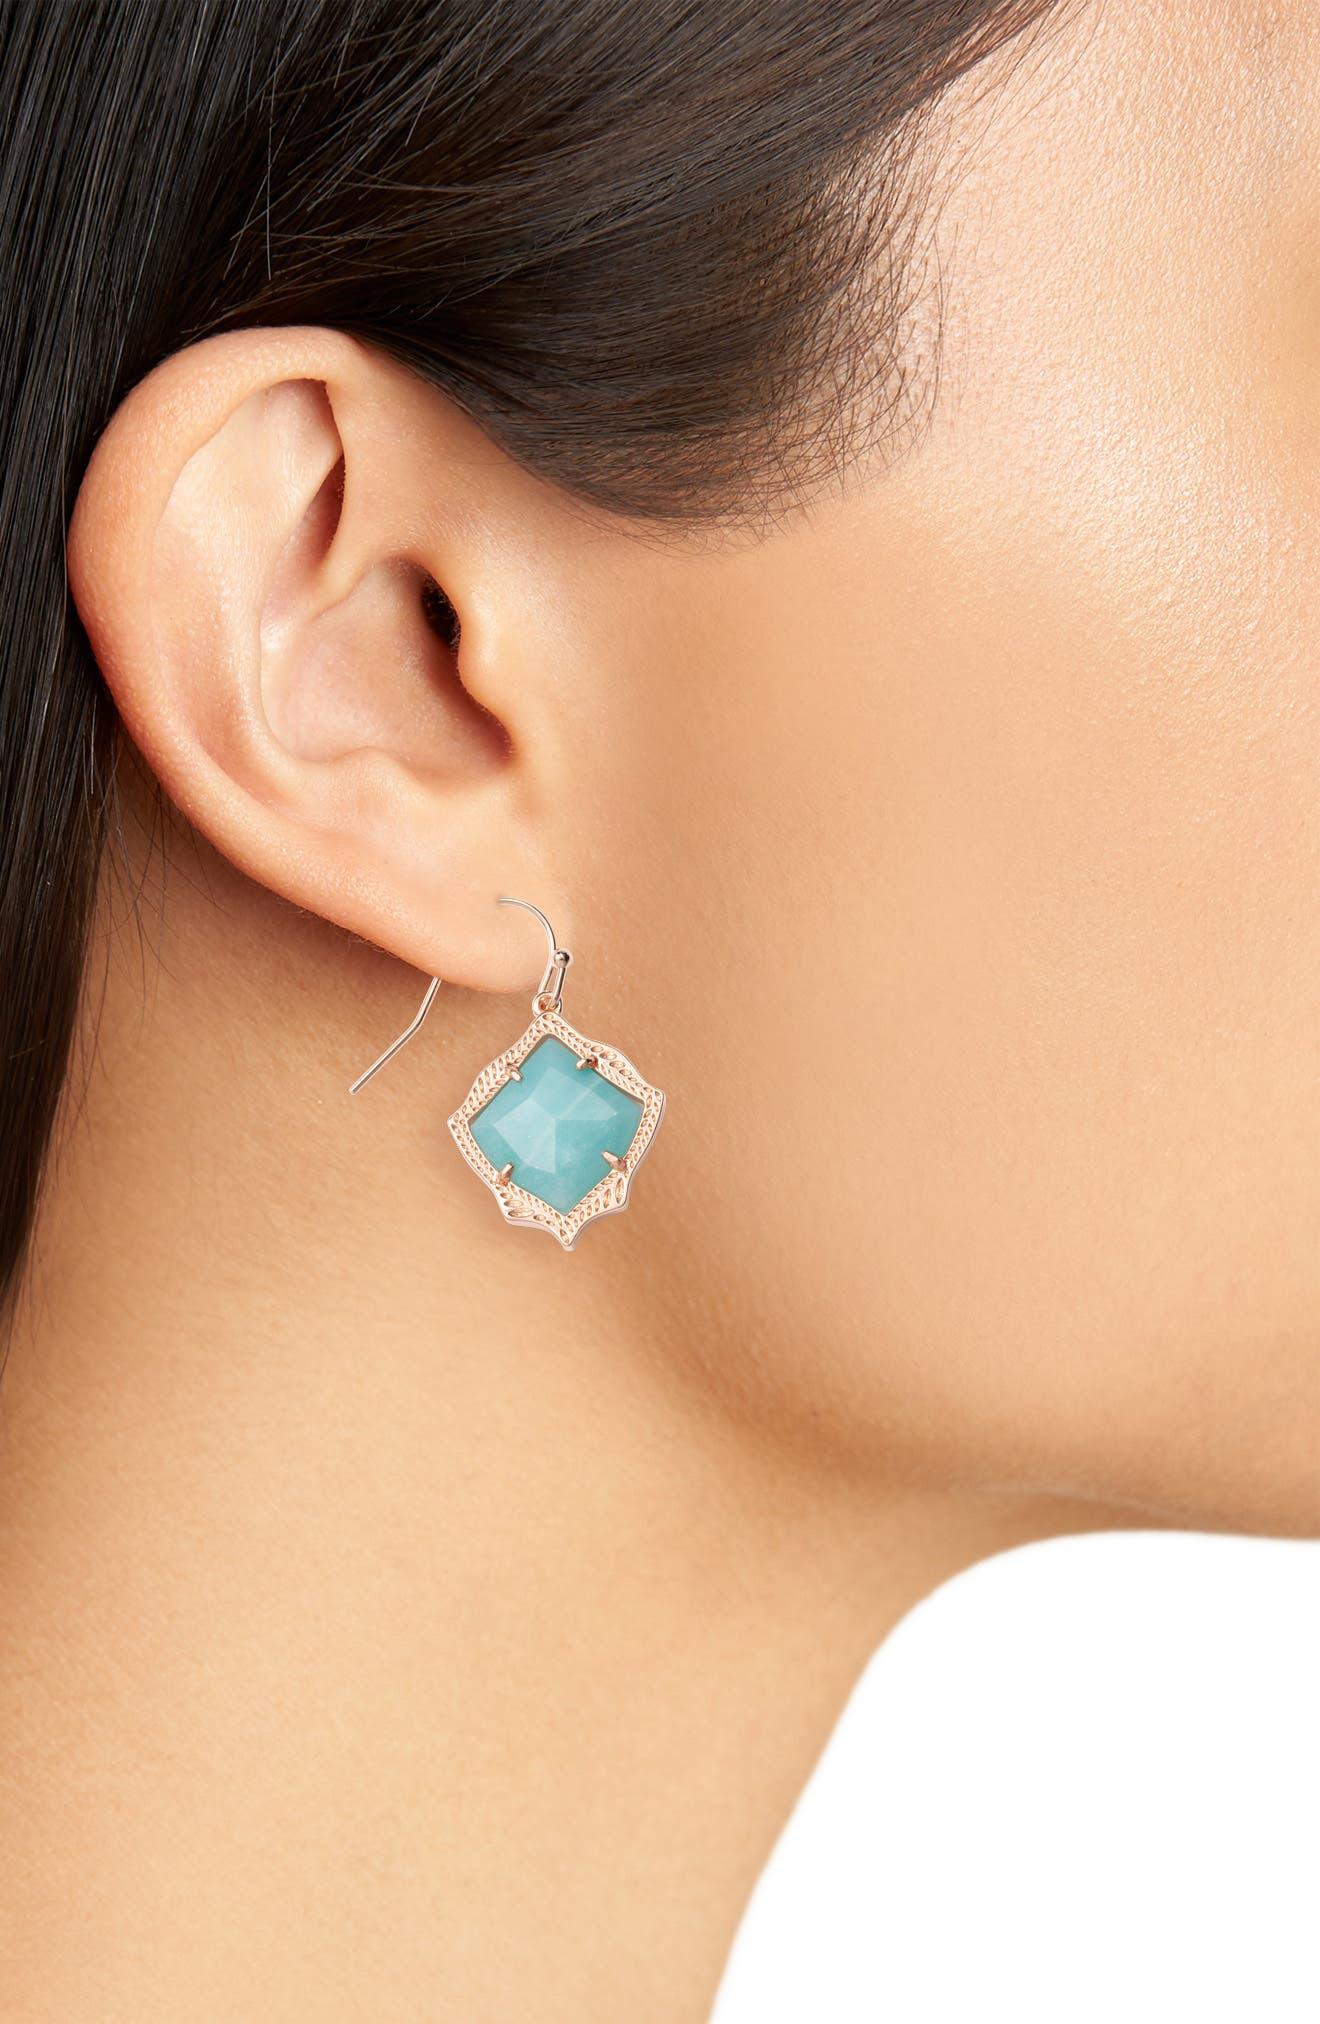 KENDRA SCOTT, Kyrie Drop Earrings, Alternate thumbnail 2, color, AMAZONITE/ ROSE GOLD